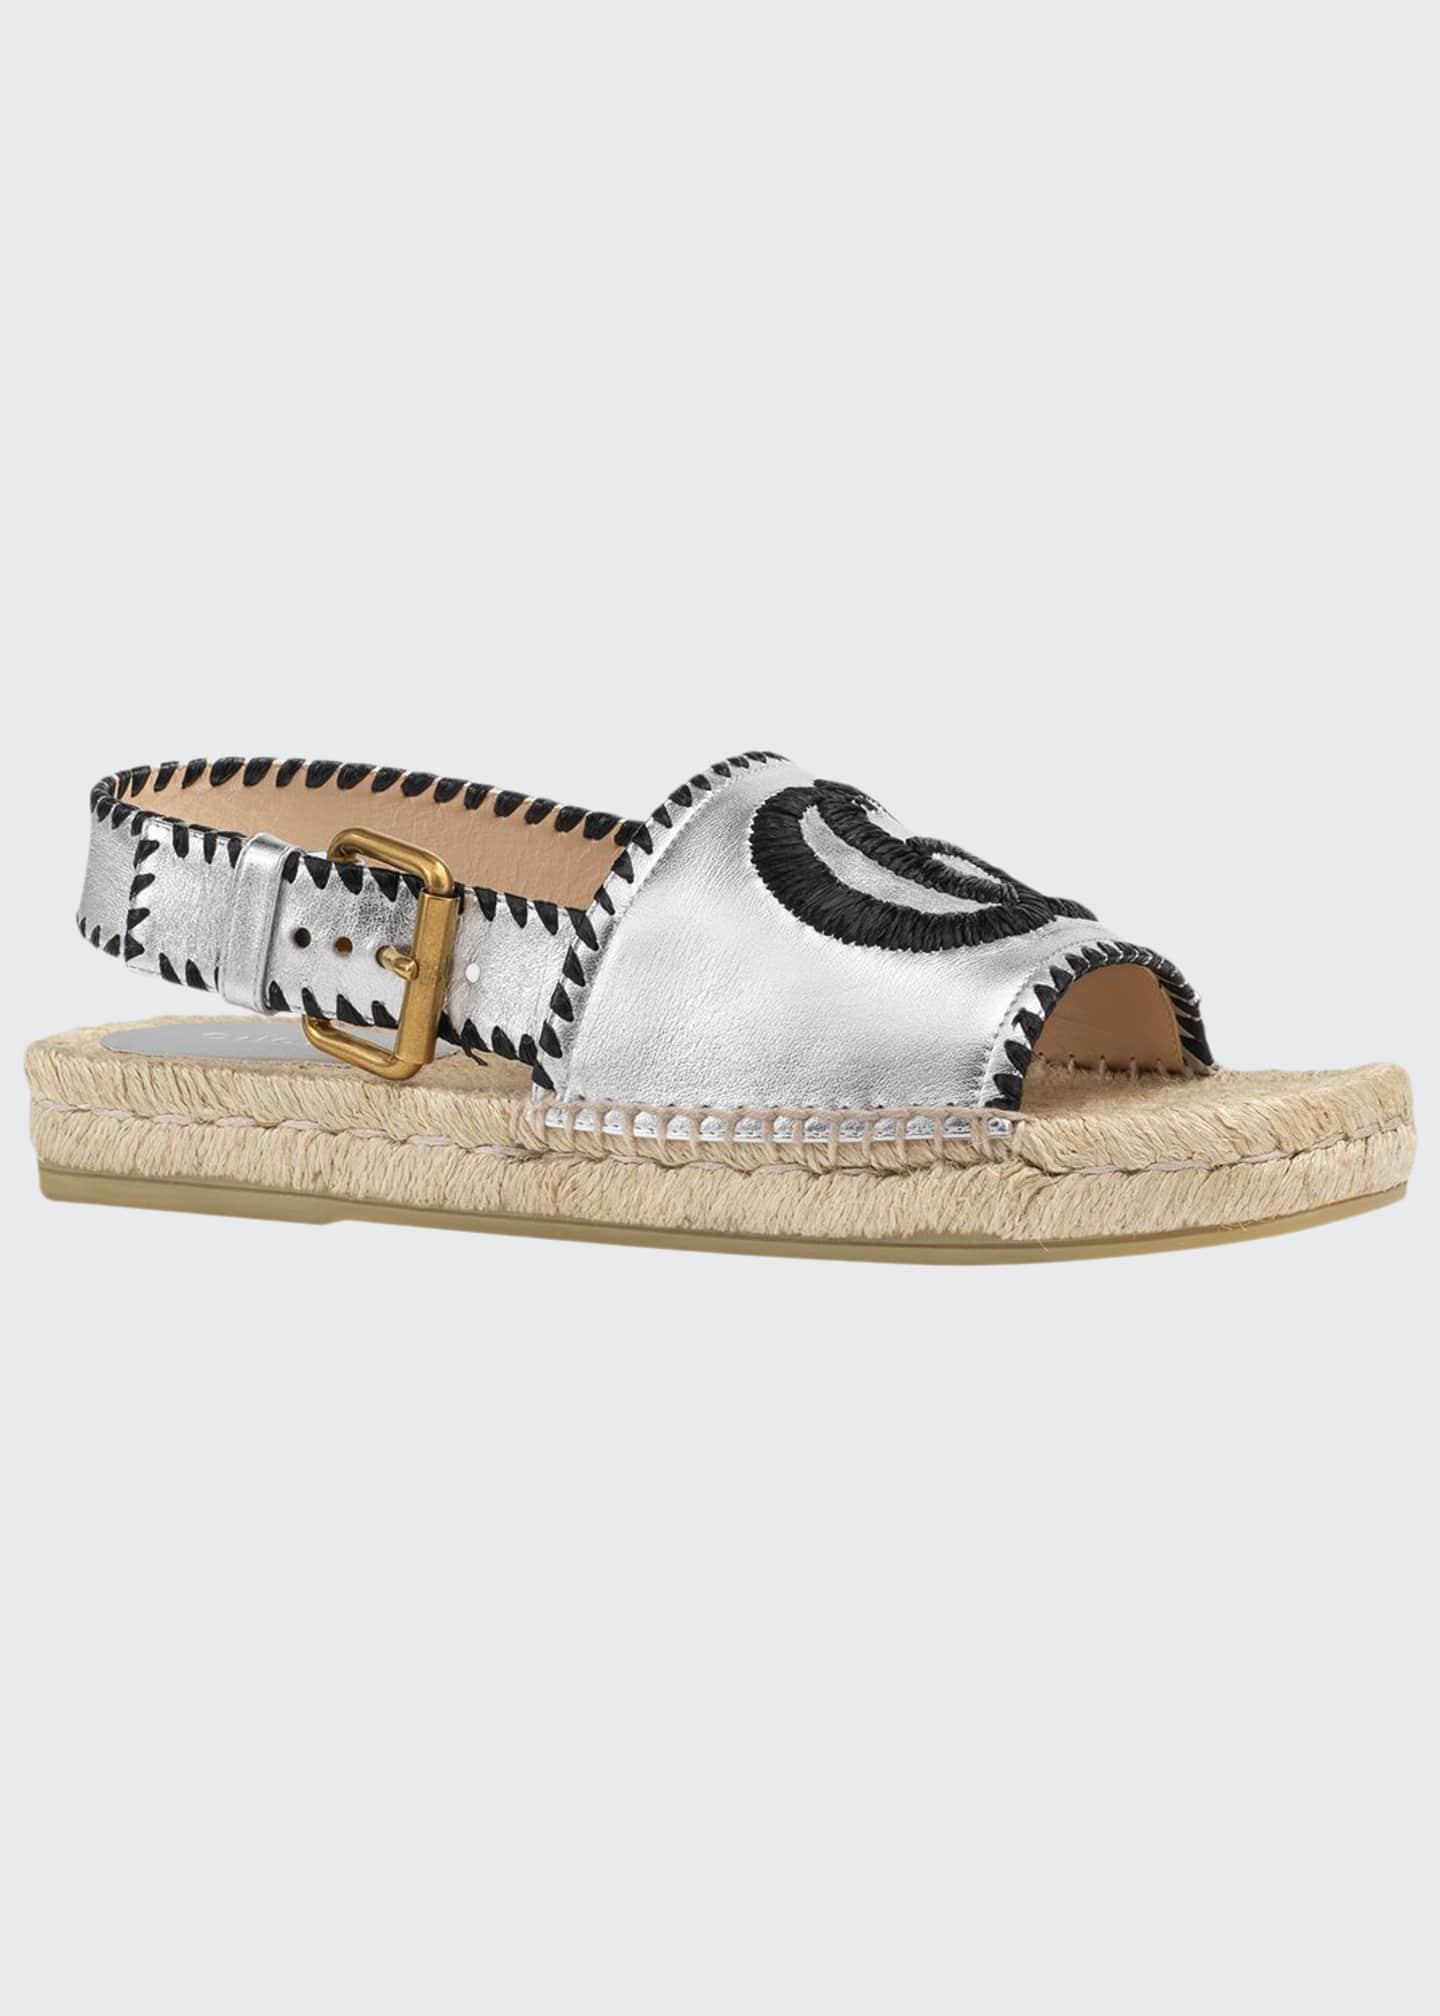 Gucci Pilar Square-Toe GG Espadrille Sandals